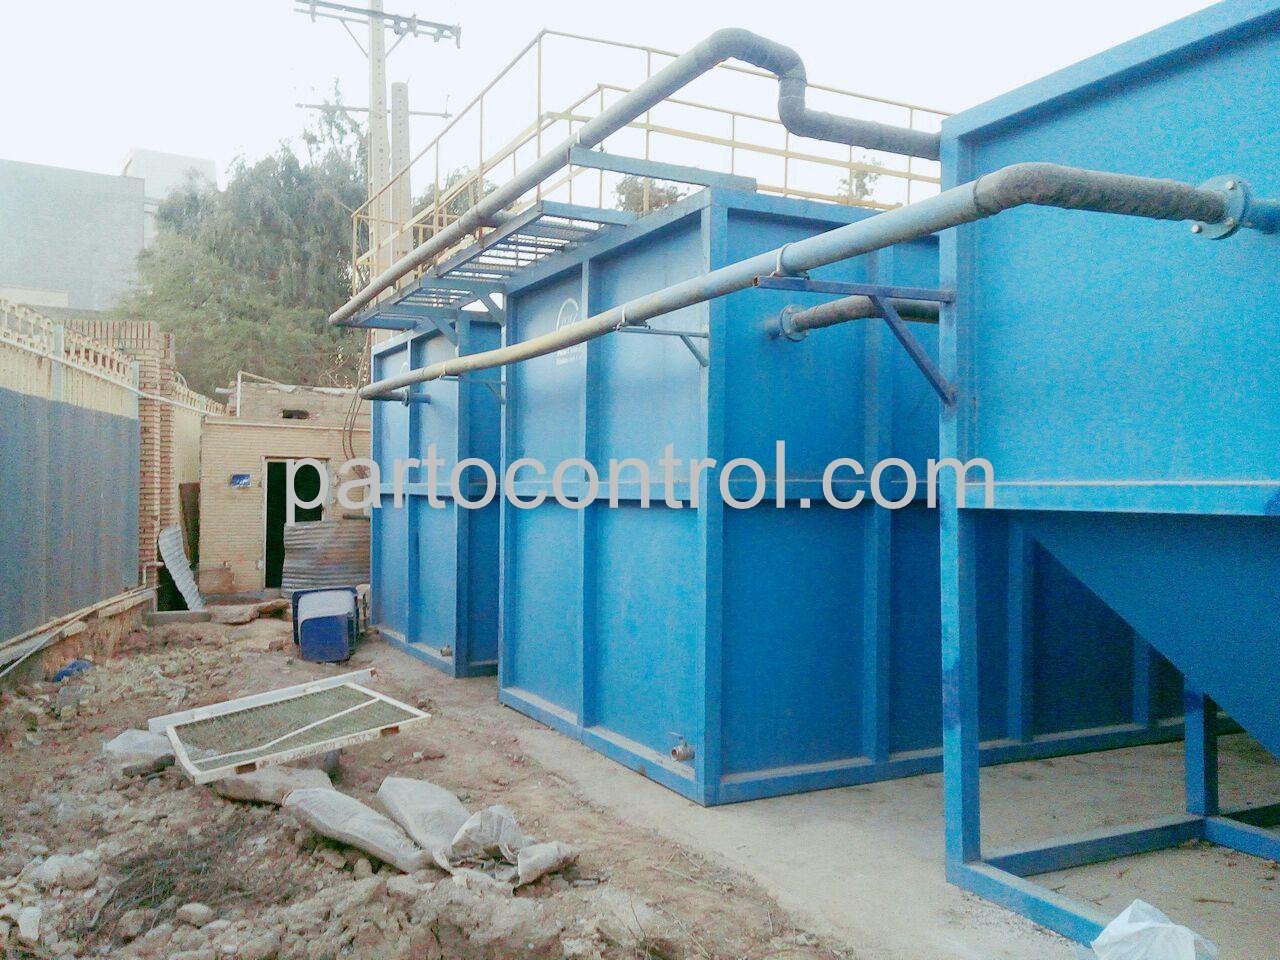 Hospital Sewage Treatmentتصفیه فاضلاب بیمارستانی بیمارستان شفا1 - پروژه تصفیه فاضلاب بیمارستانی